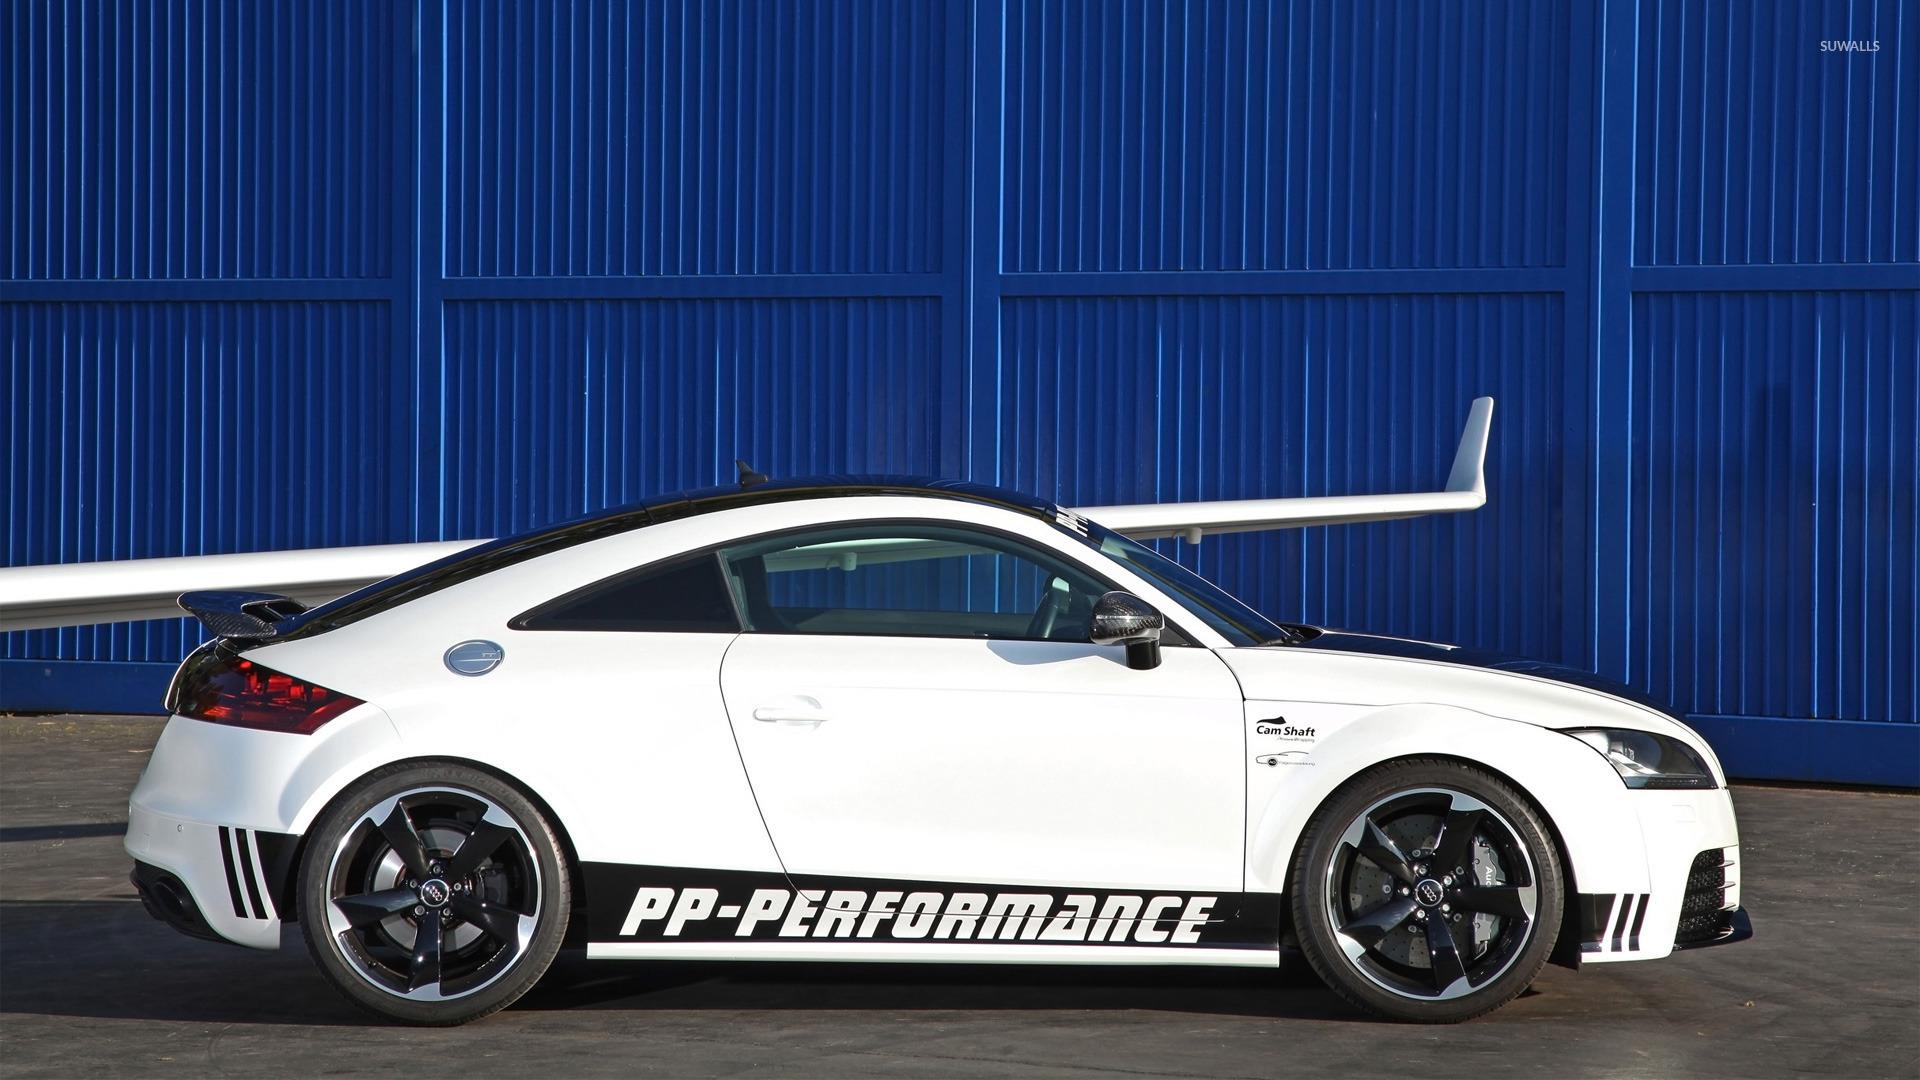 2013 Audi TT RS [3] wallpaper   Car wallpapers   24755 1920x1080